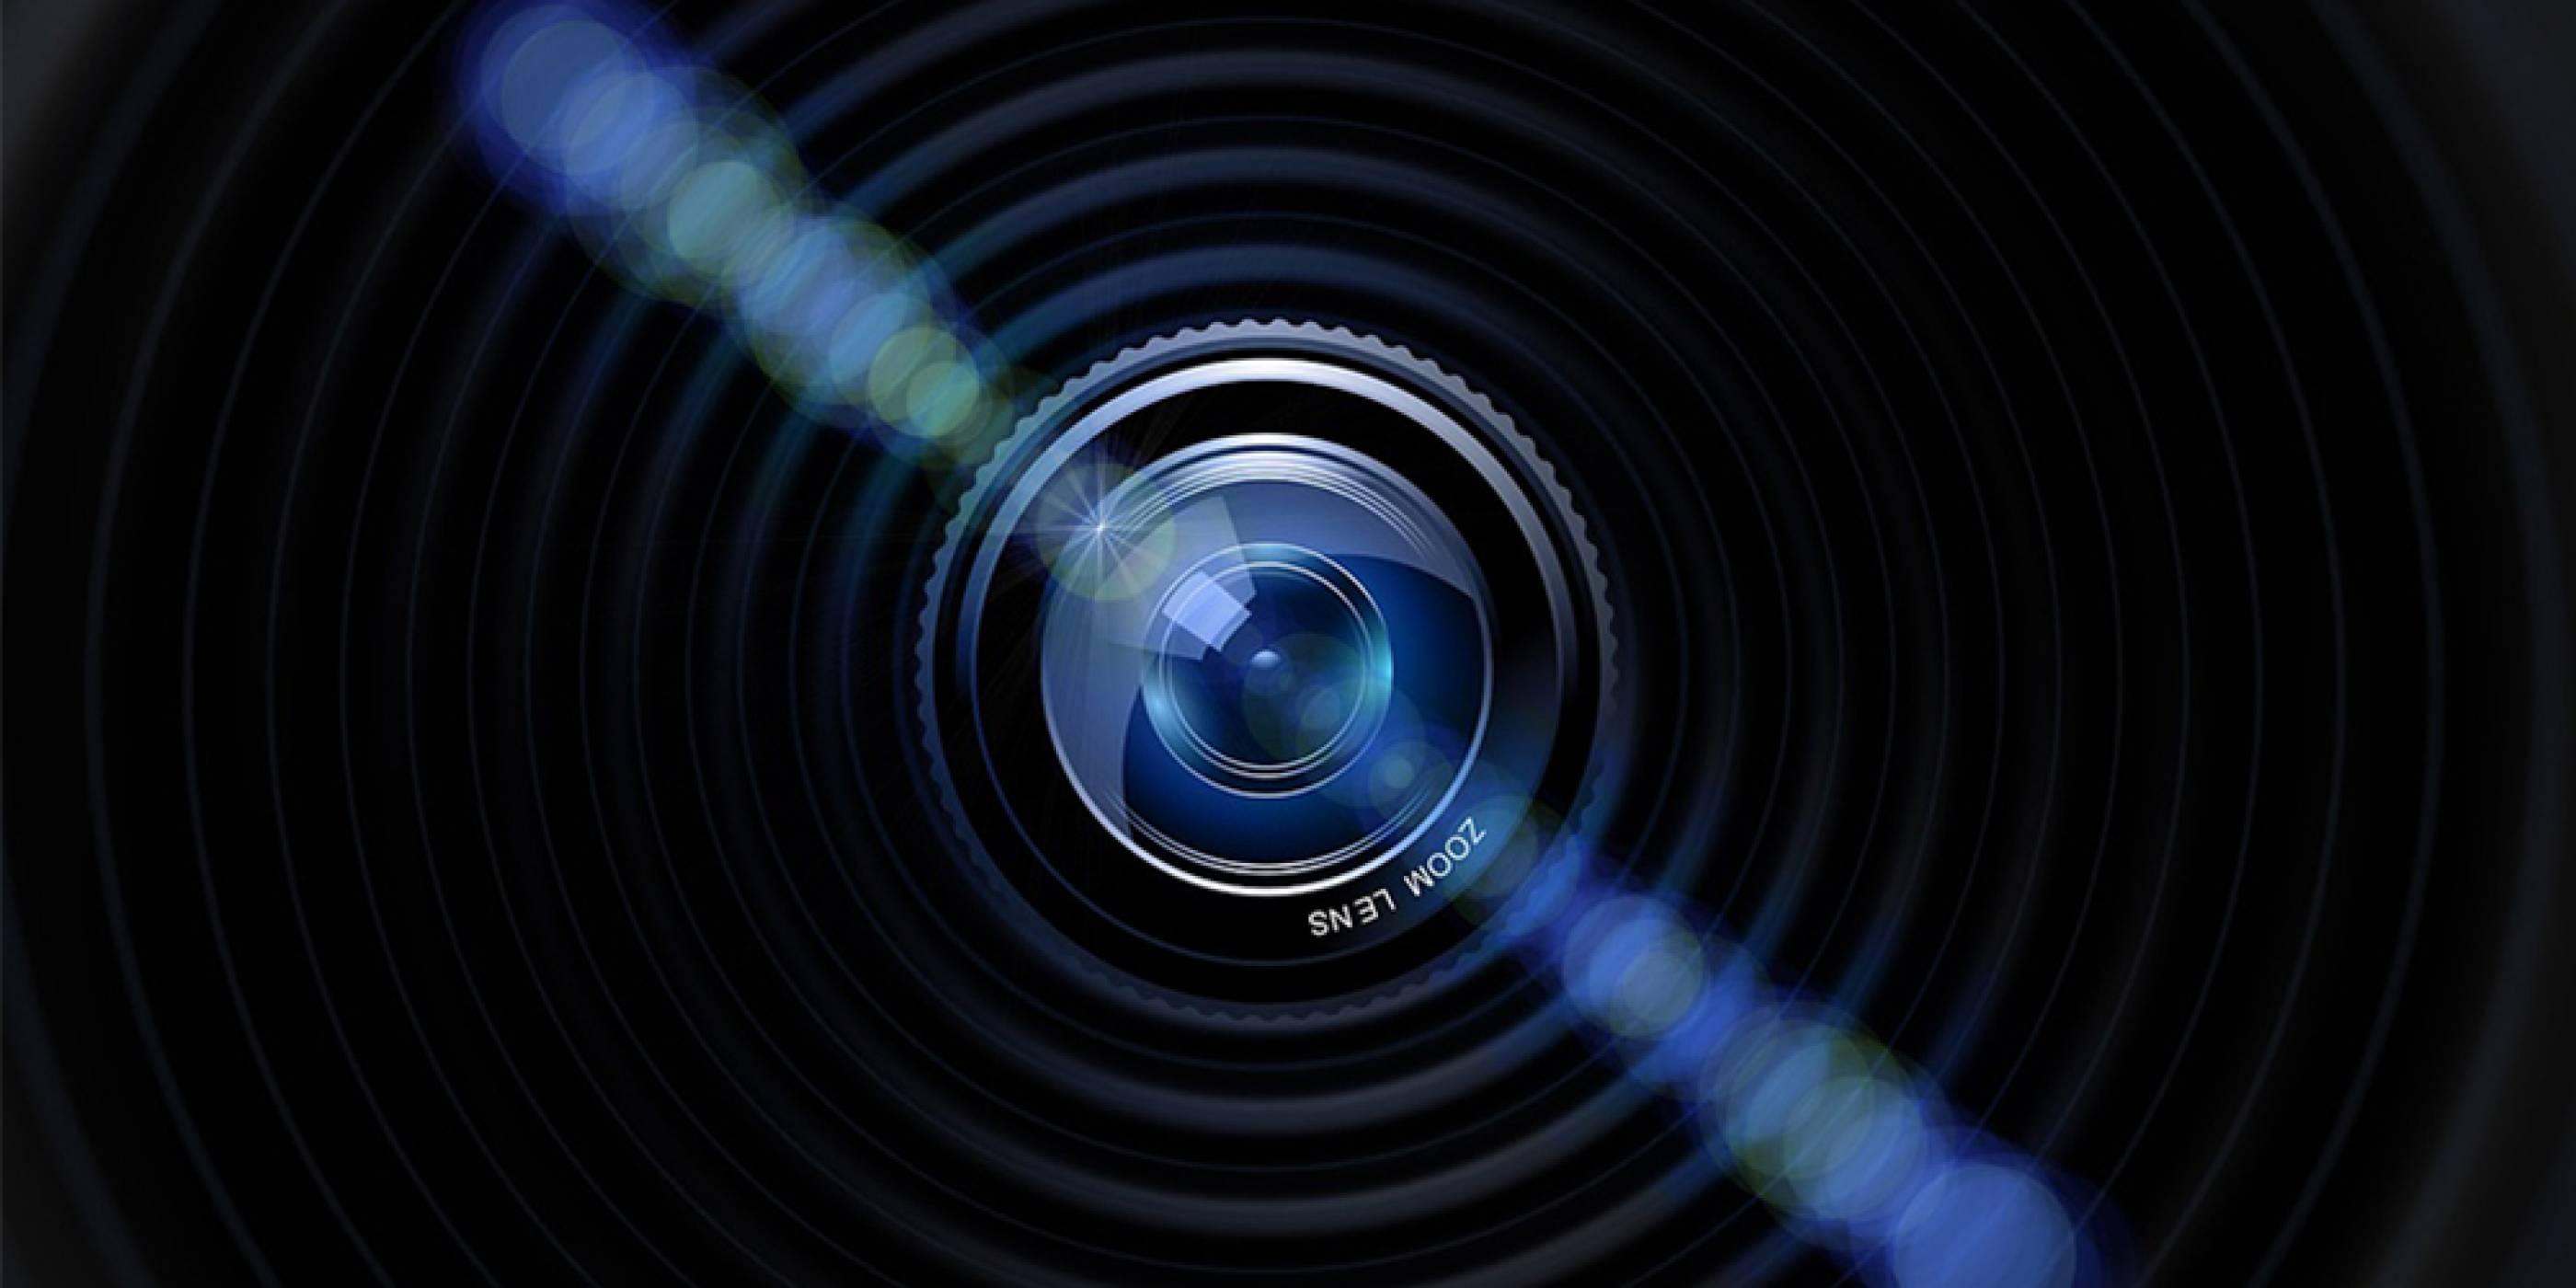 DJI Zenmuse X7 е дрон камера с 6K, RAW и Apple ProRe възможности